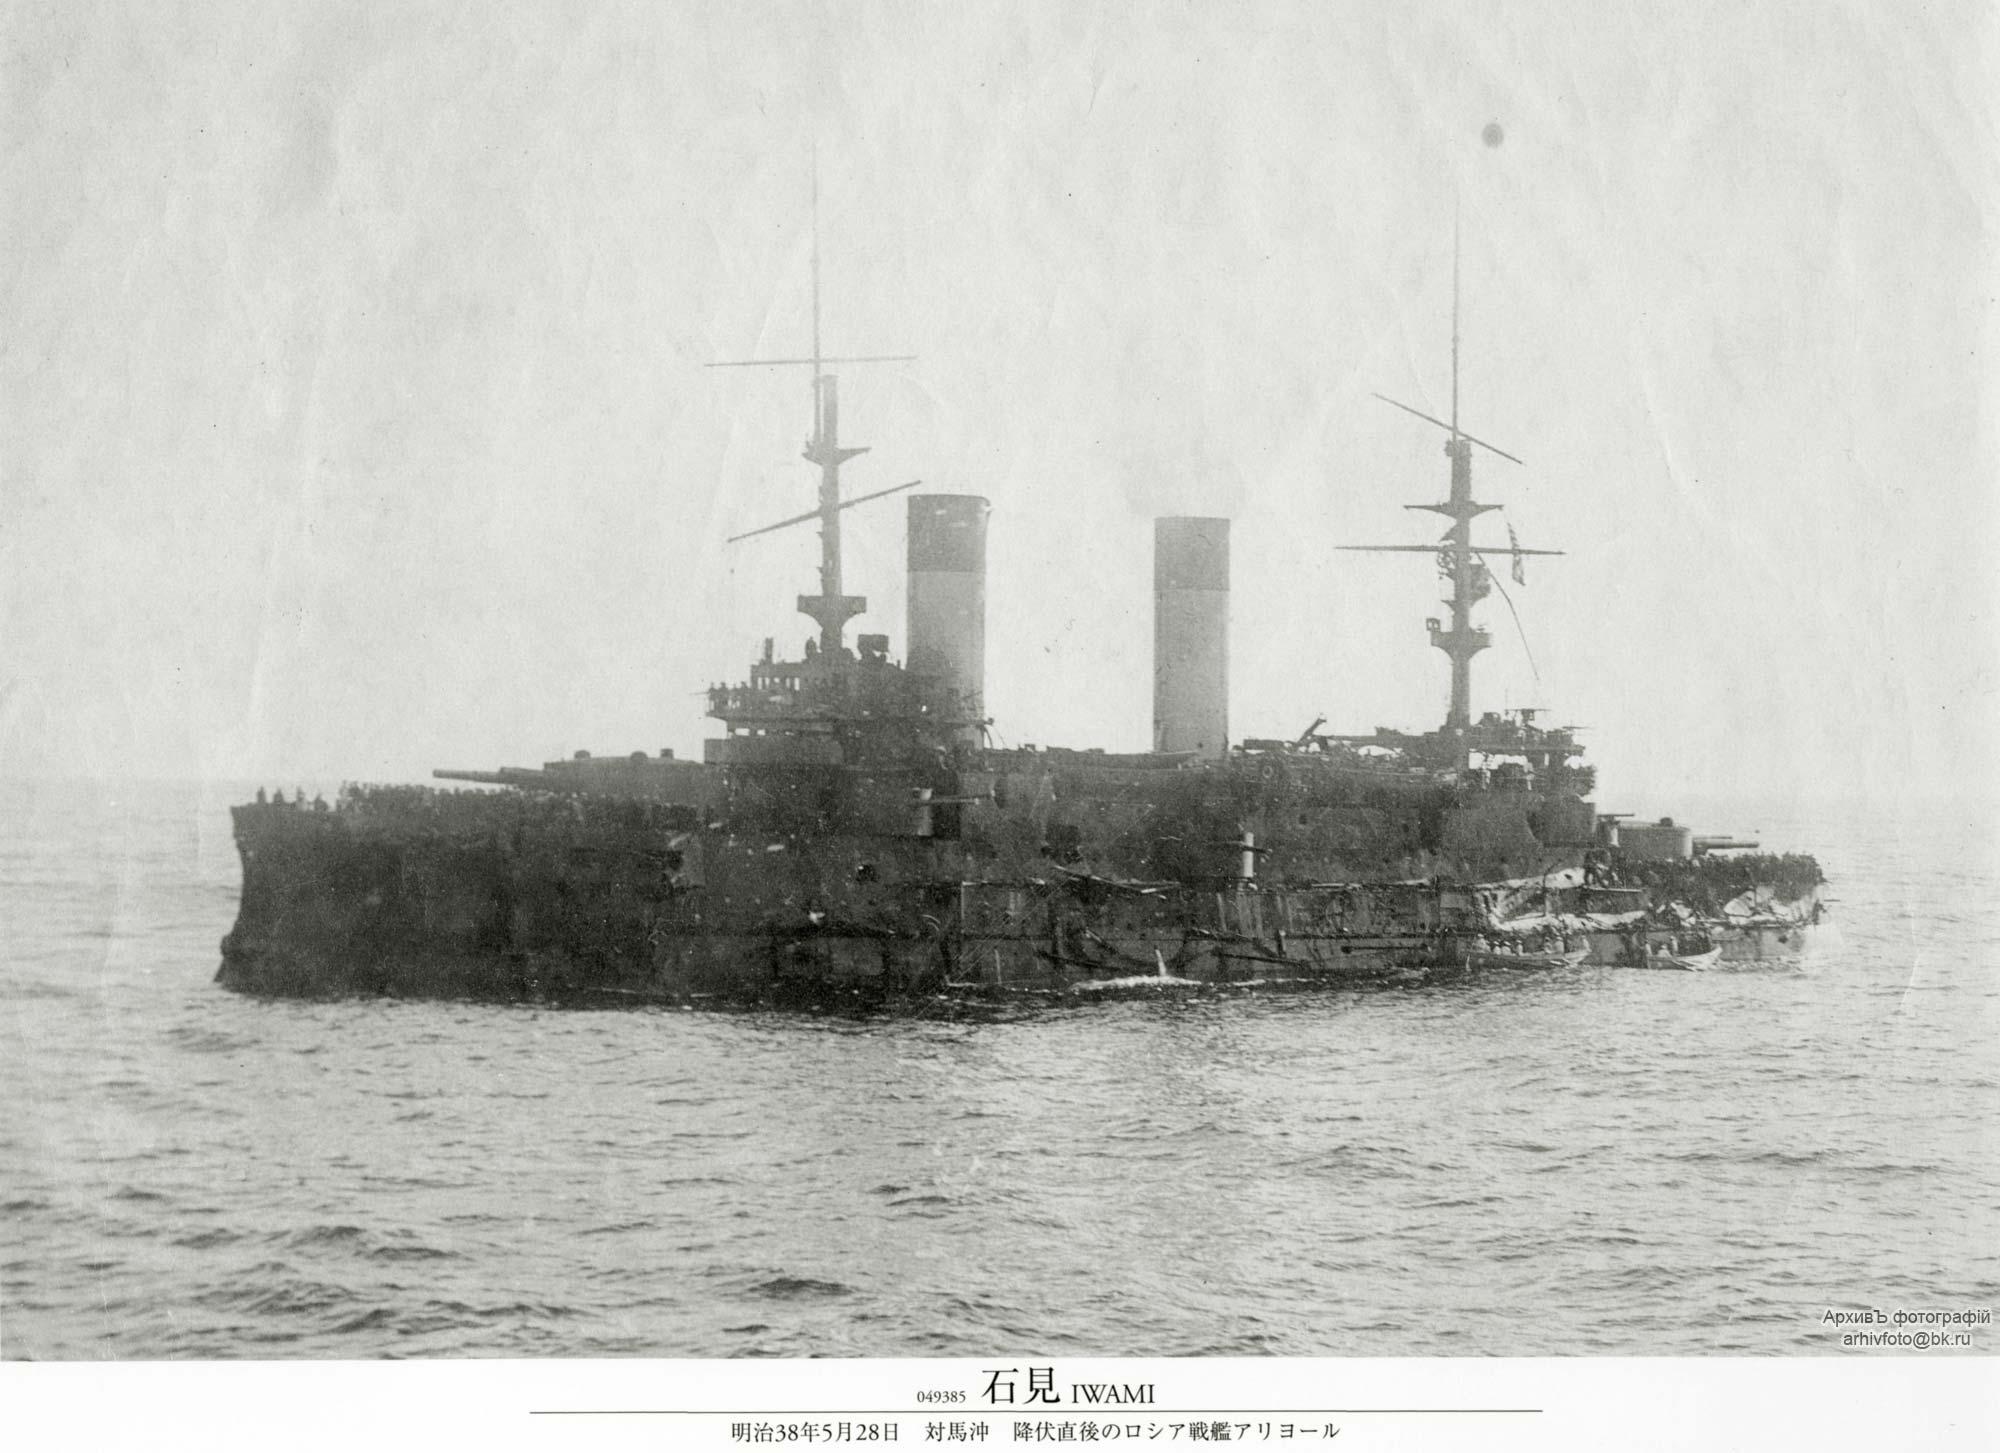 http://tsushima.su/uploads/photoarhiv/ships/russia/epoch_bron/ebr/orel/photo/10.jpg